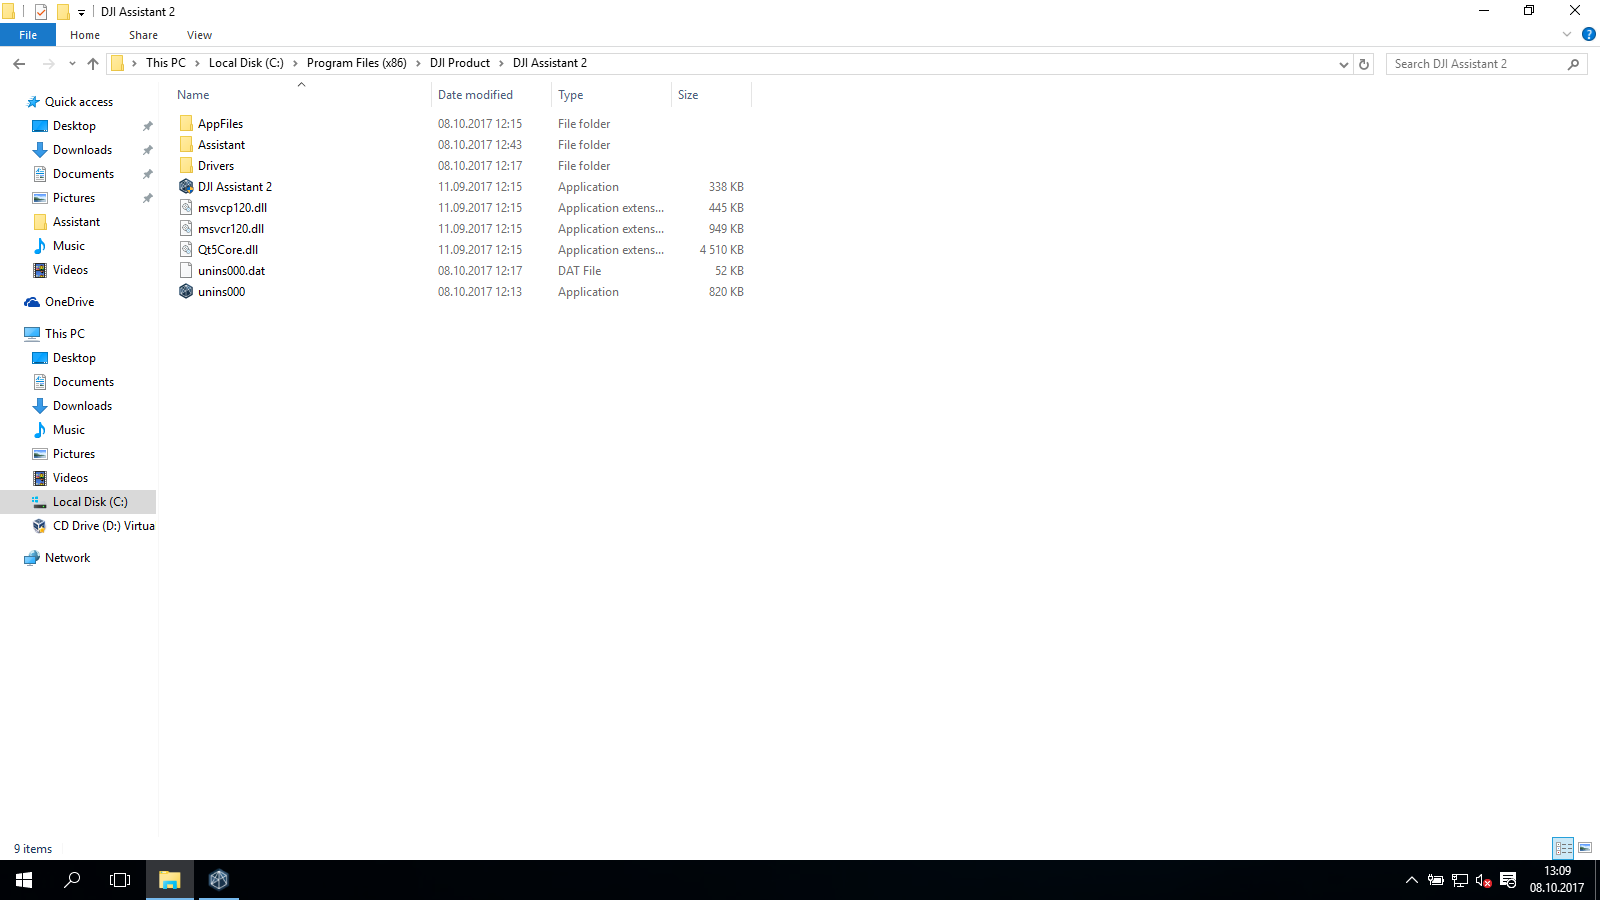 files2.png